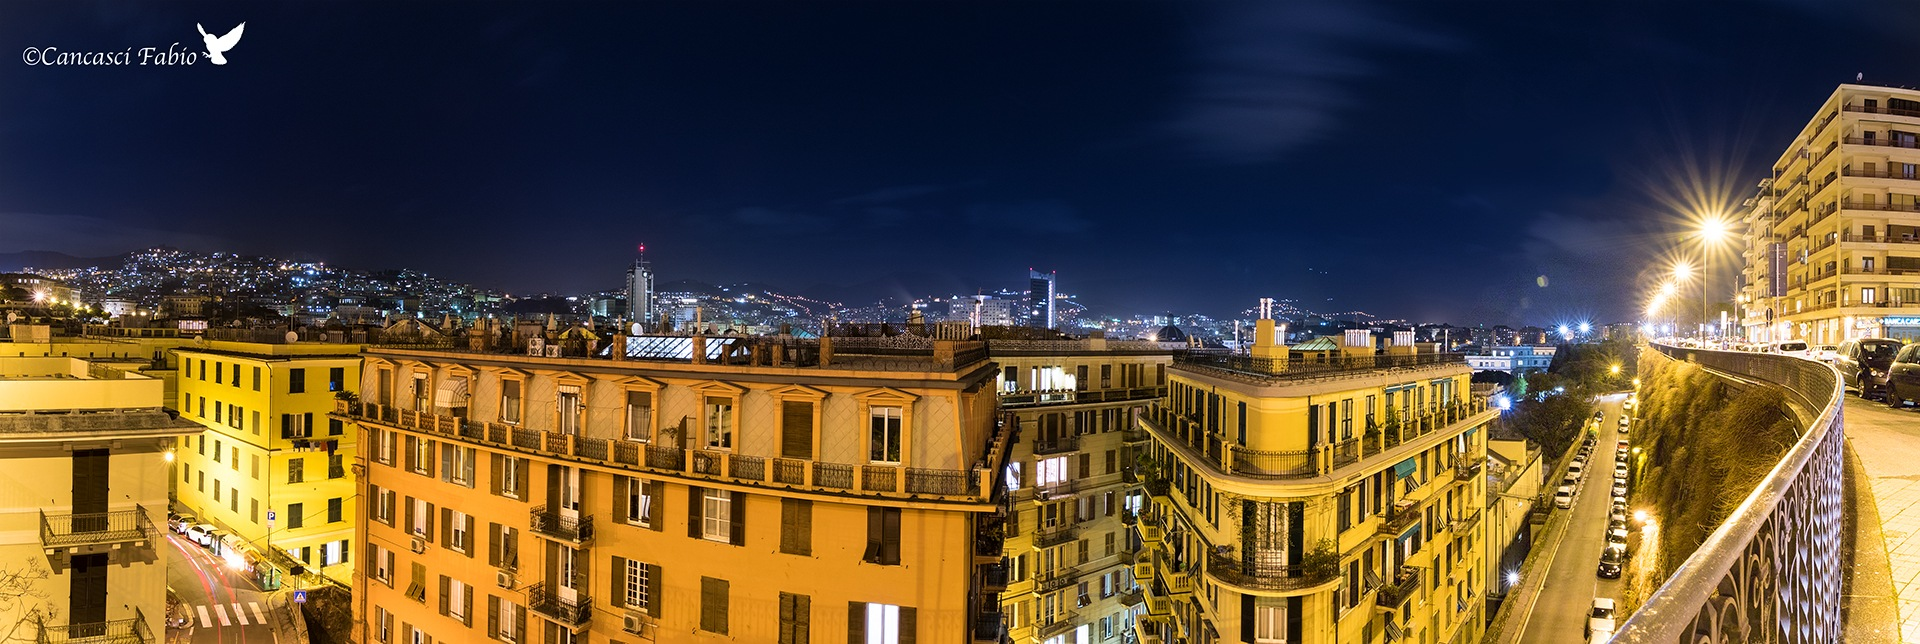 Genova by Fabio C.